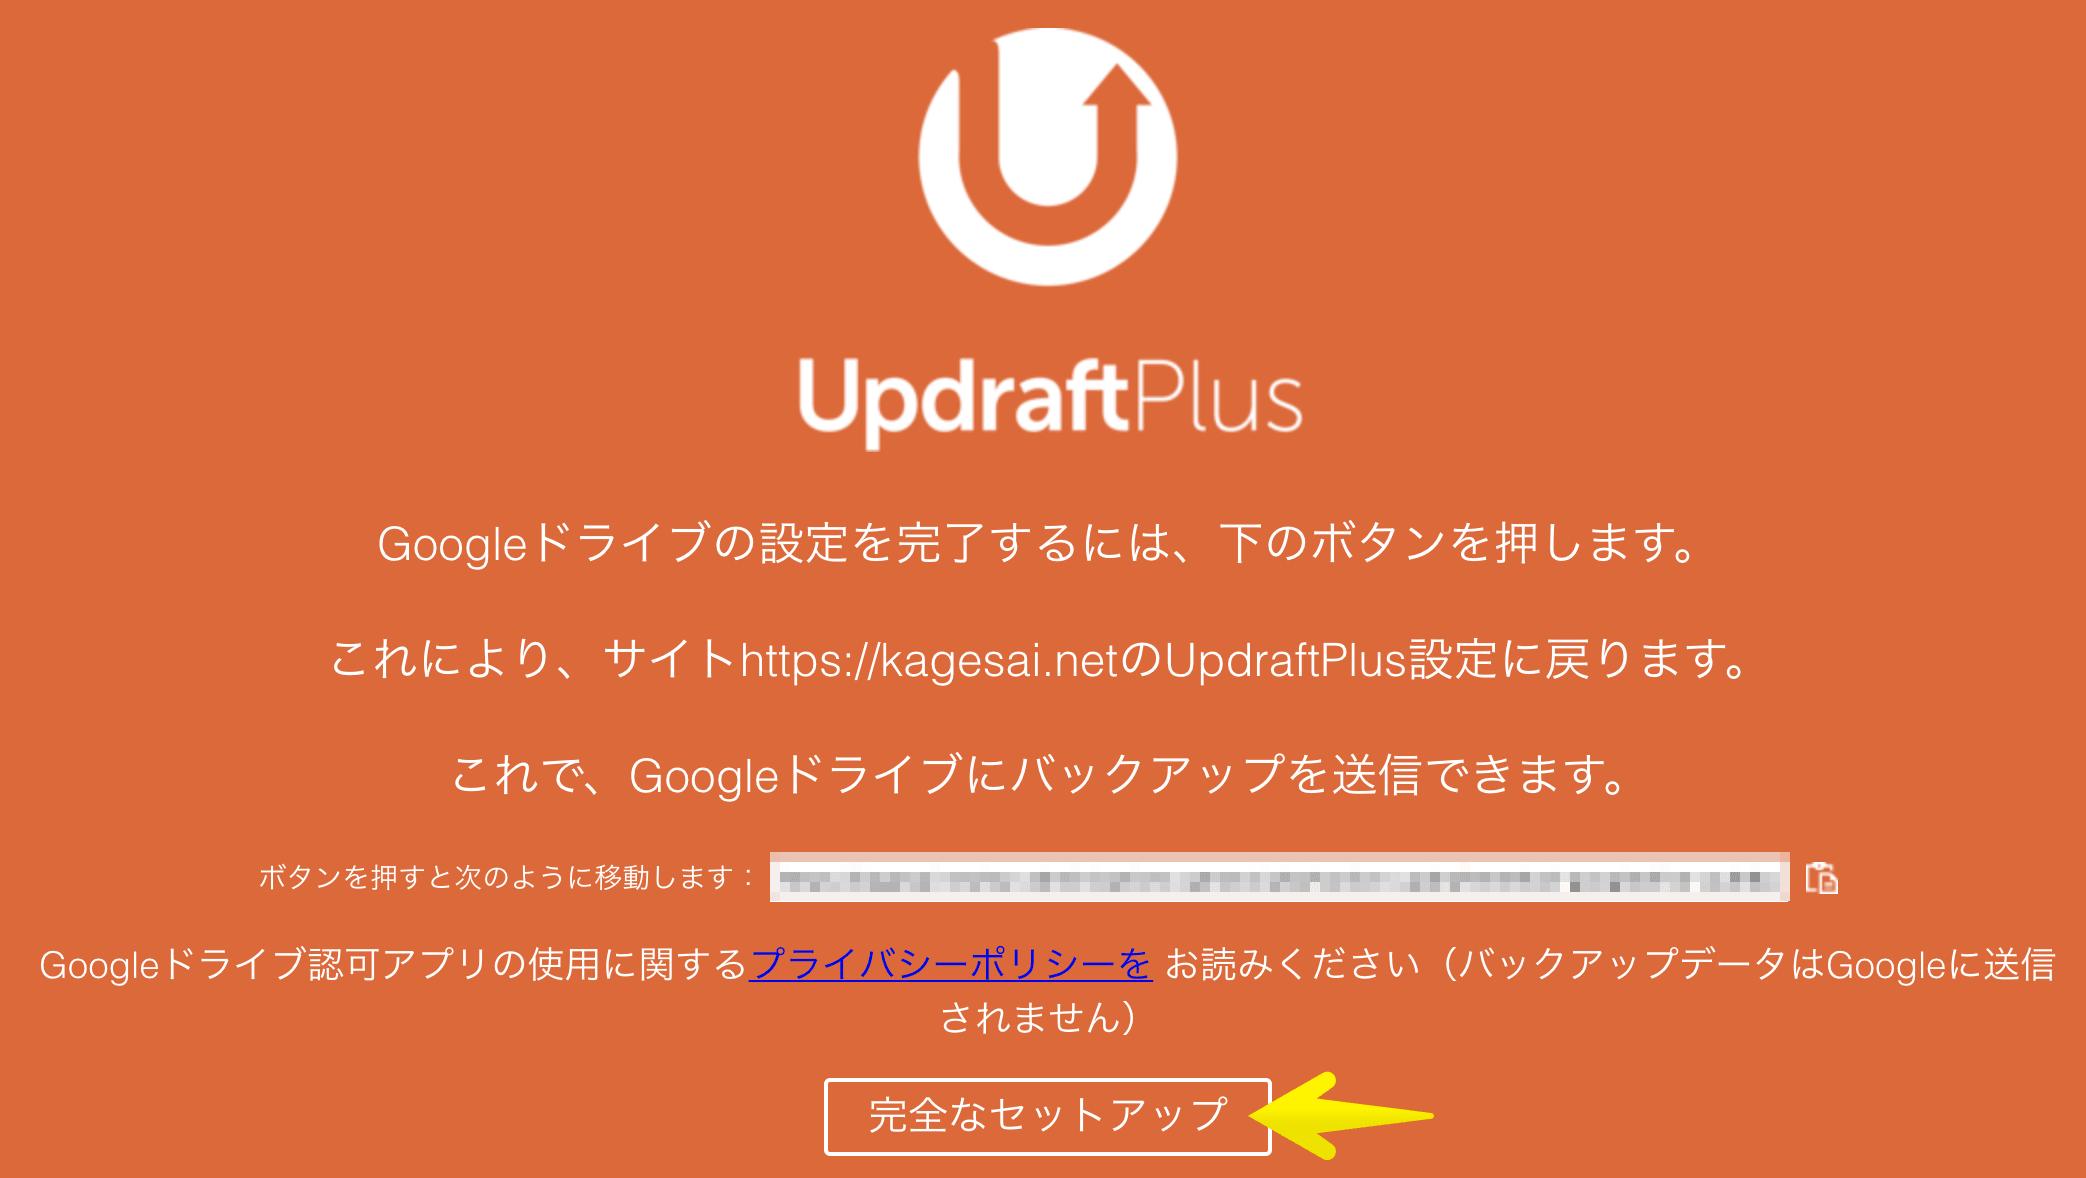 UpdraftPlus完全なセットアップ